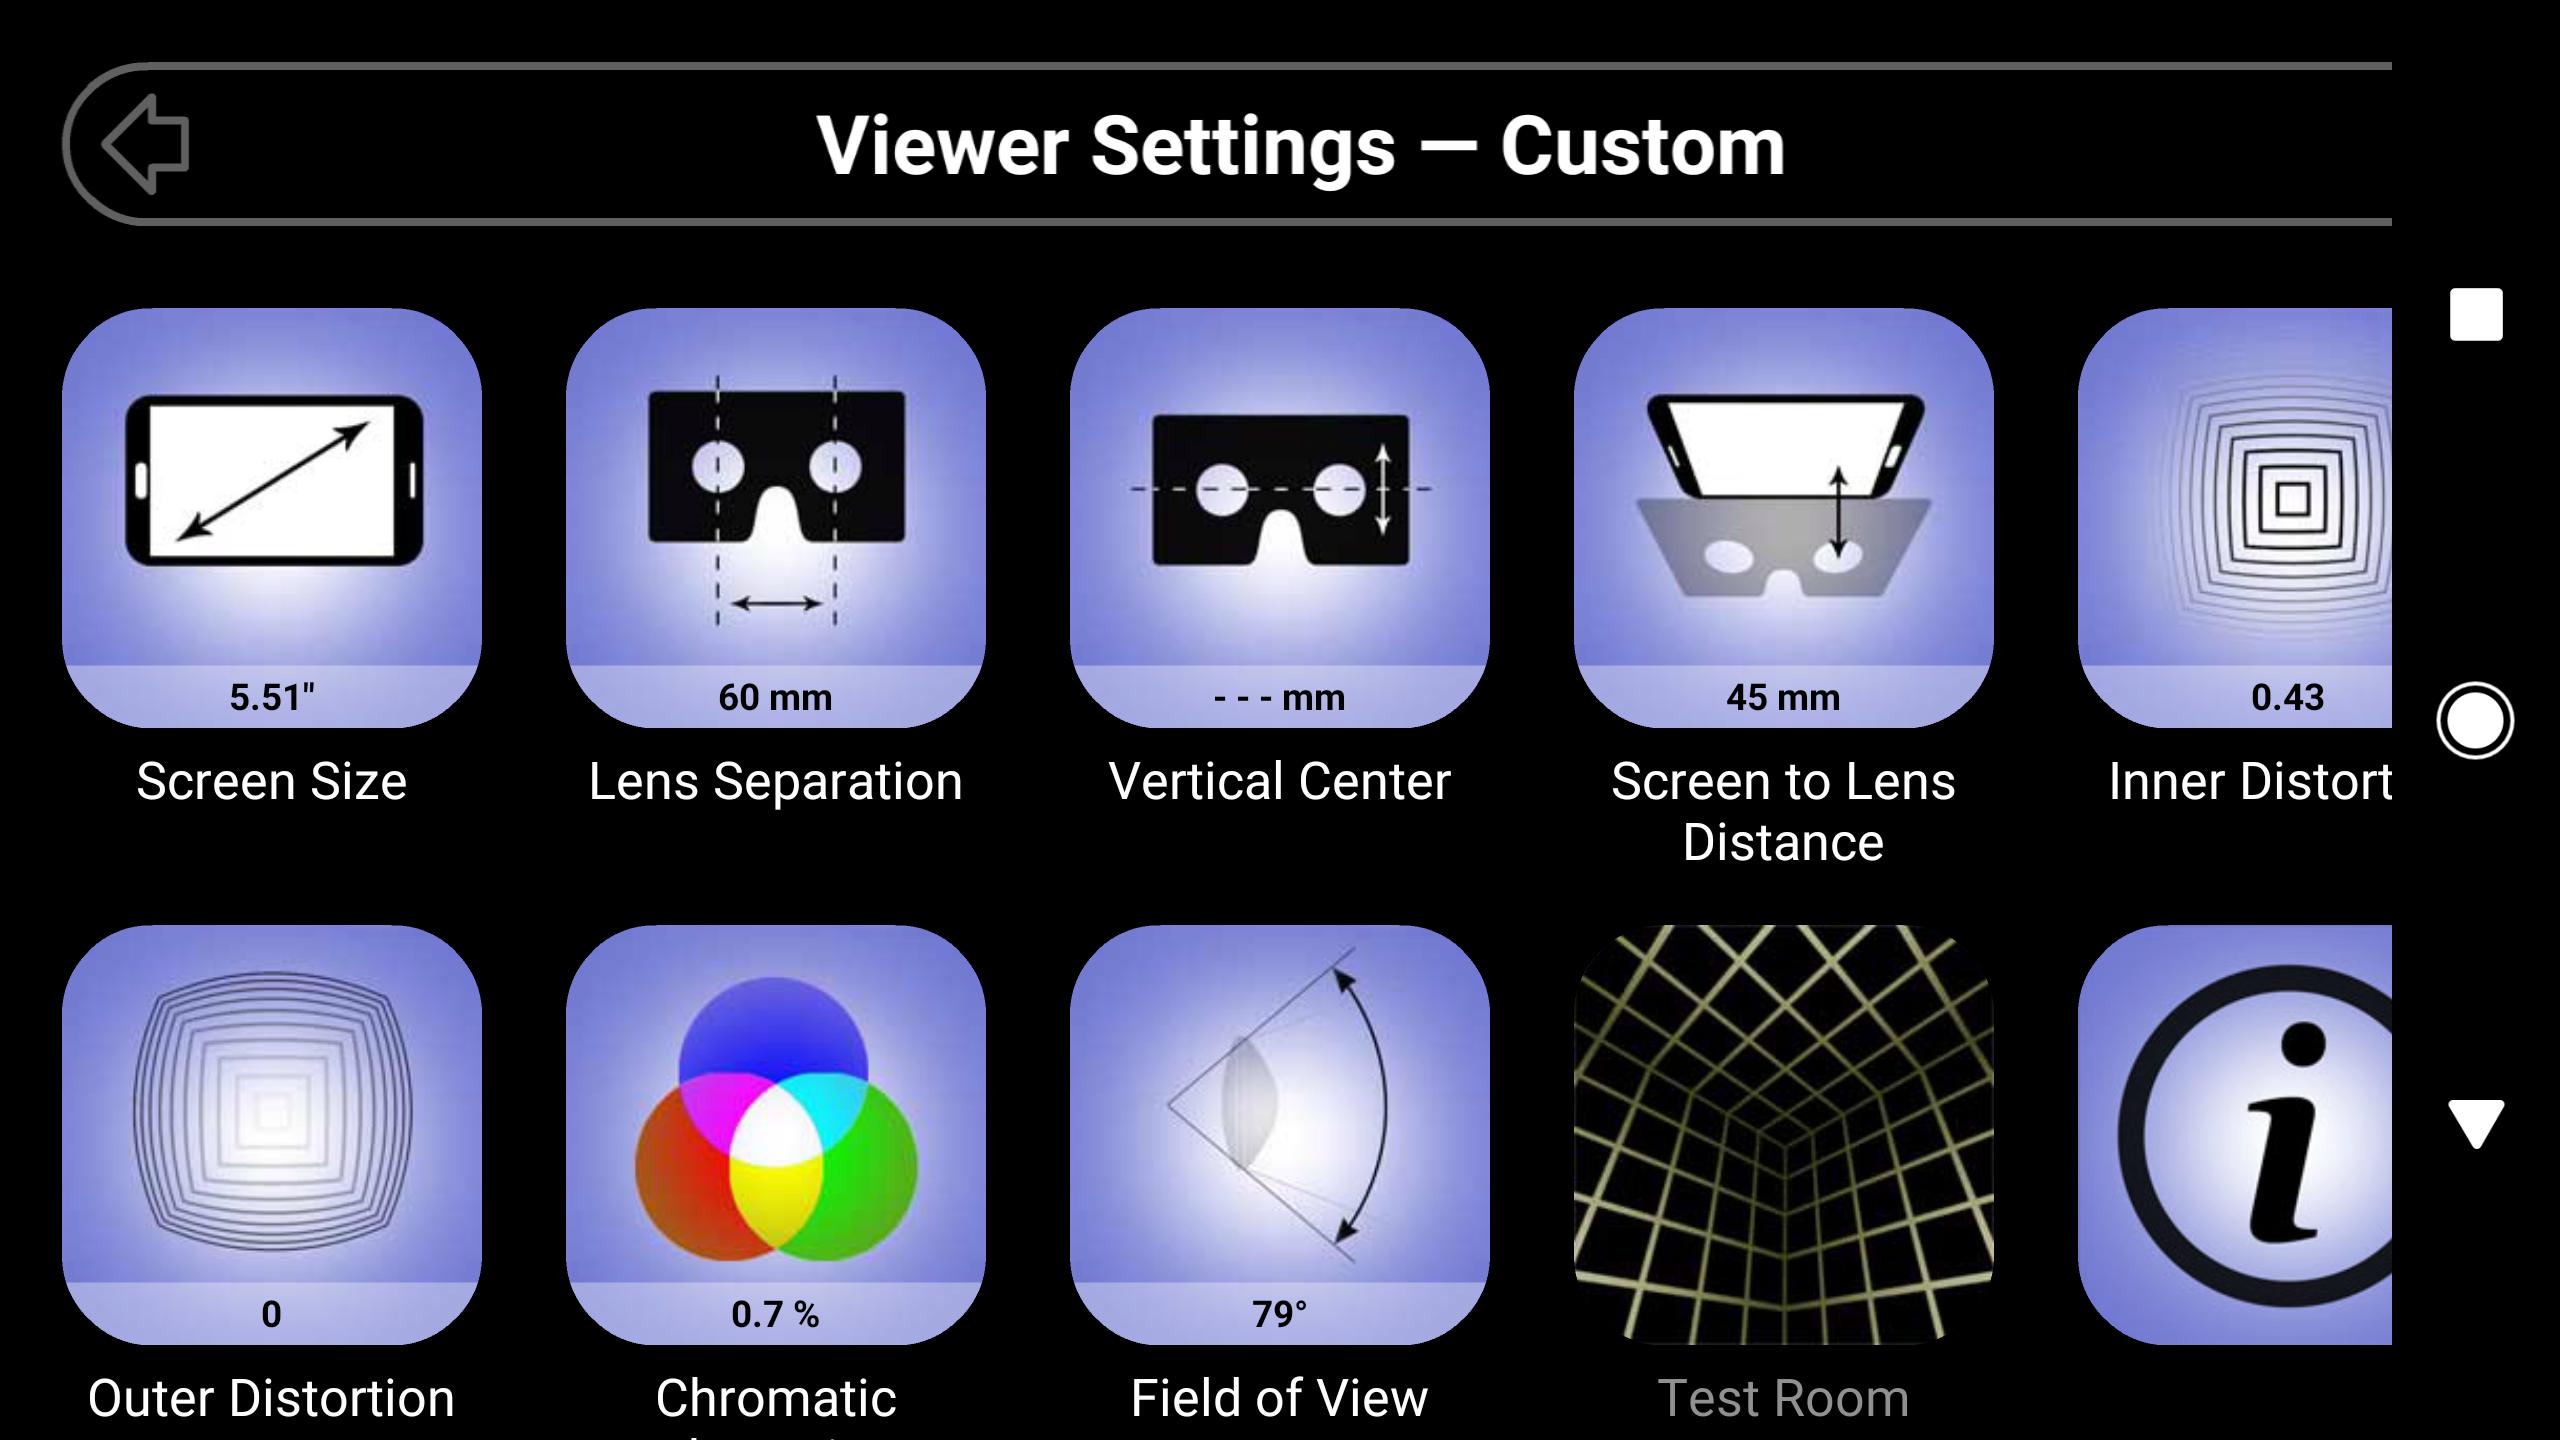 app lets you configure your vr viewer